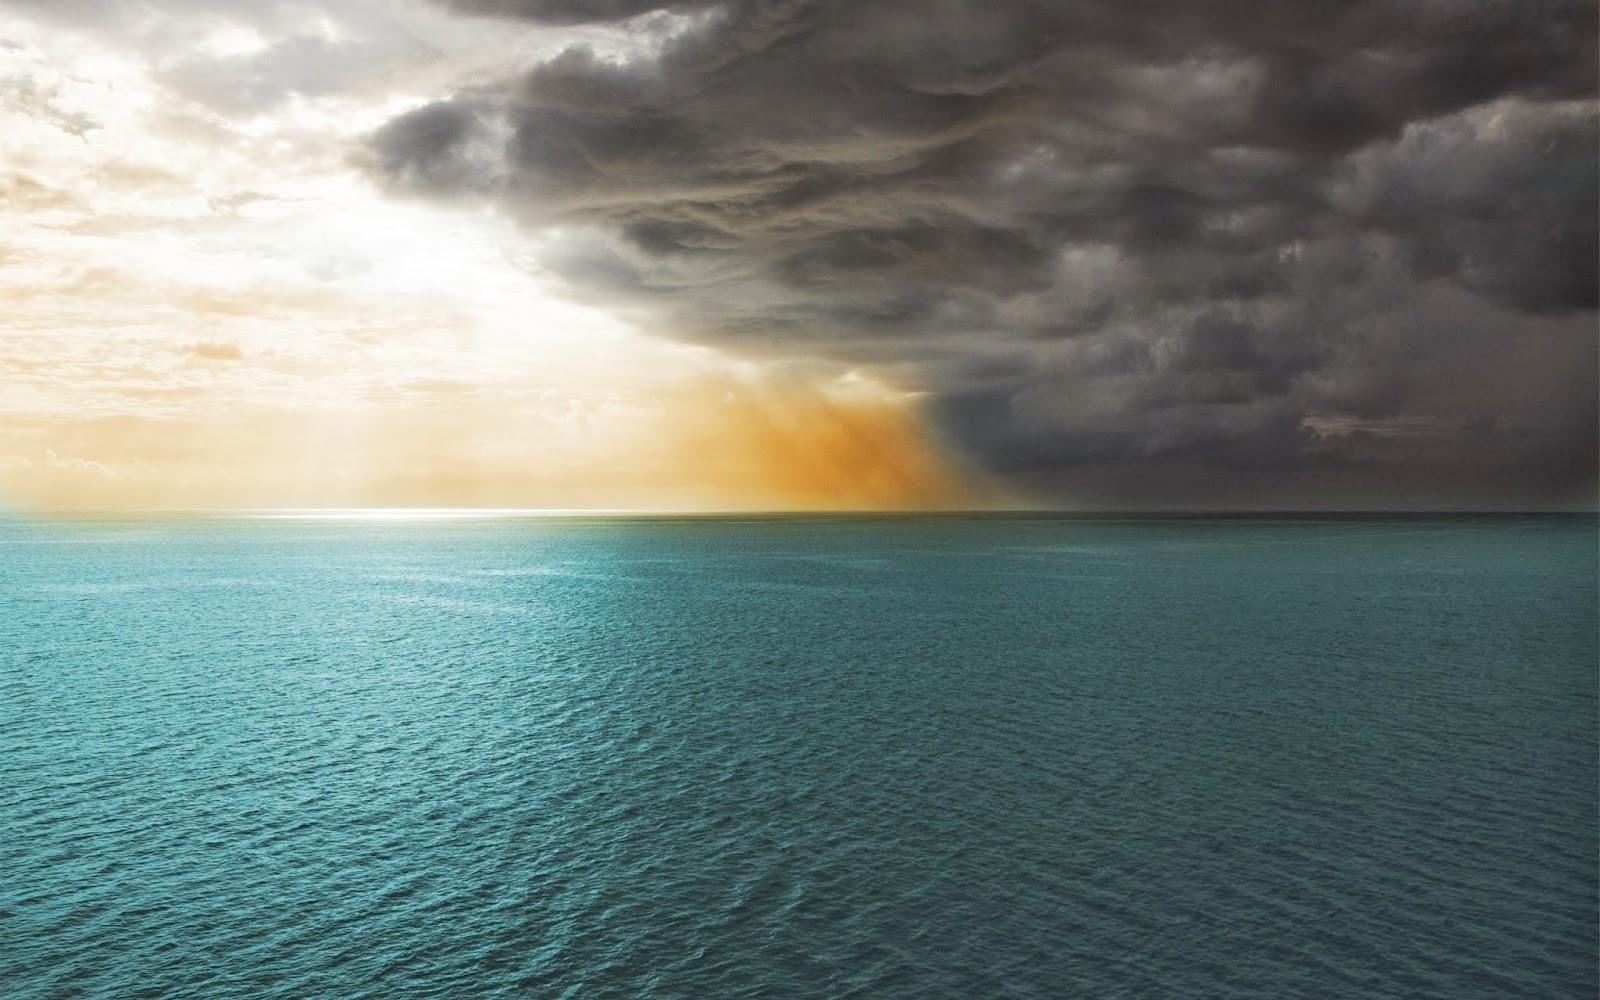 tempesta, futuro incerto, oceano